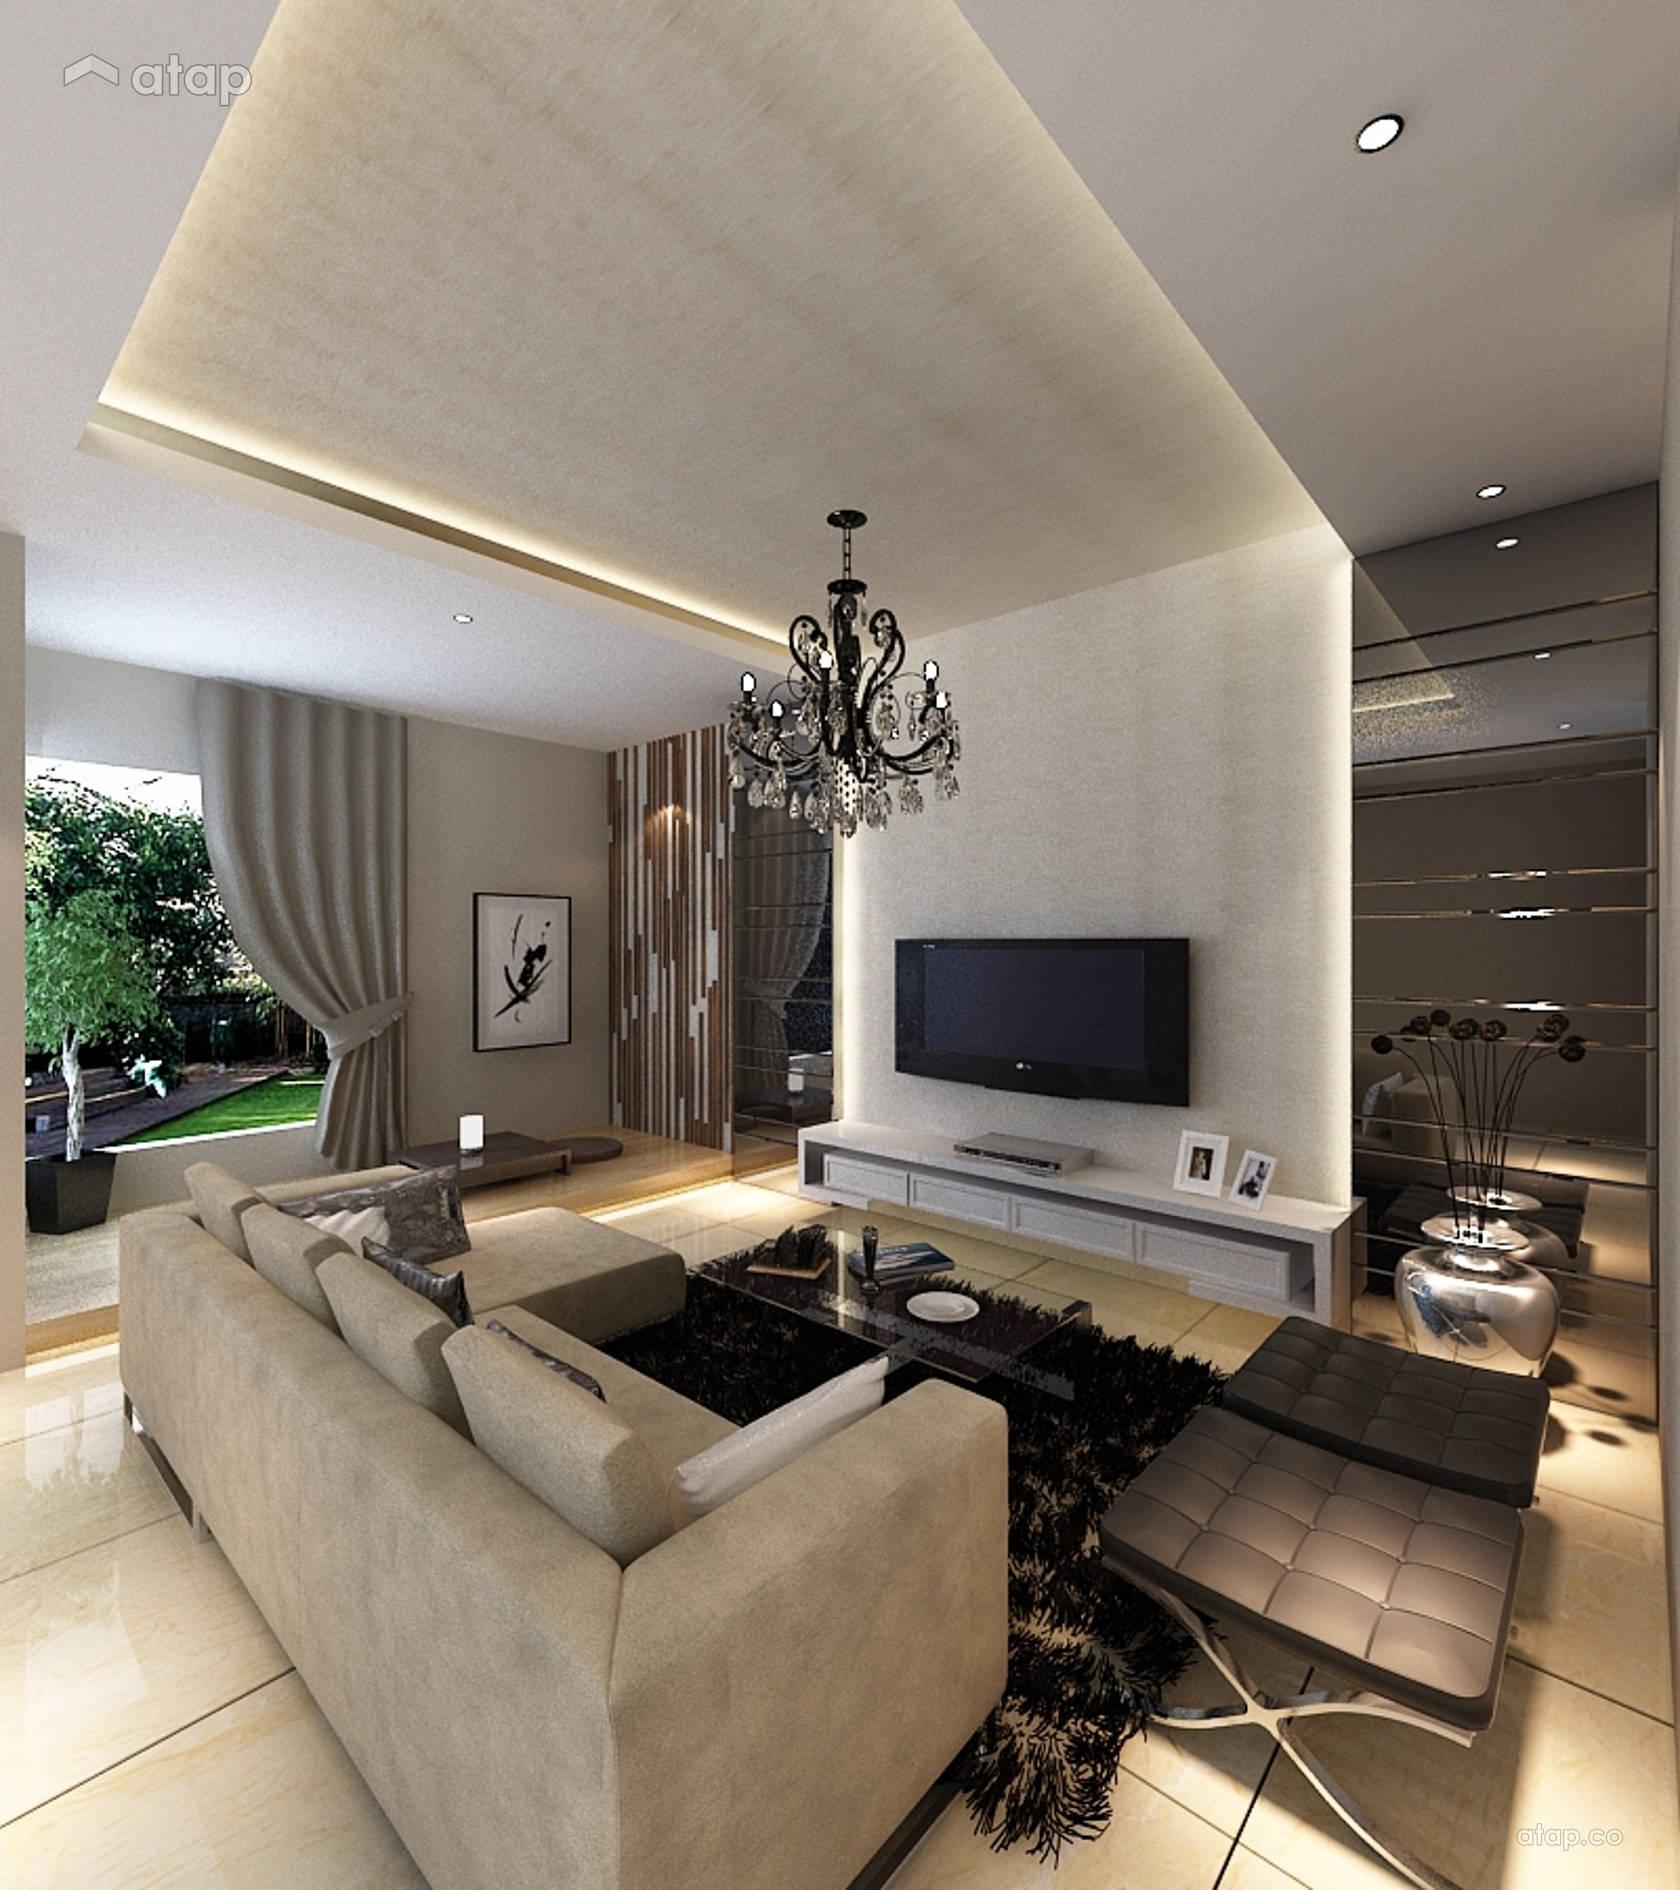 Contemporary Modern Living Room Semi-detached Design Ideas